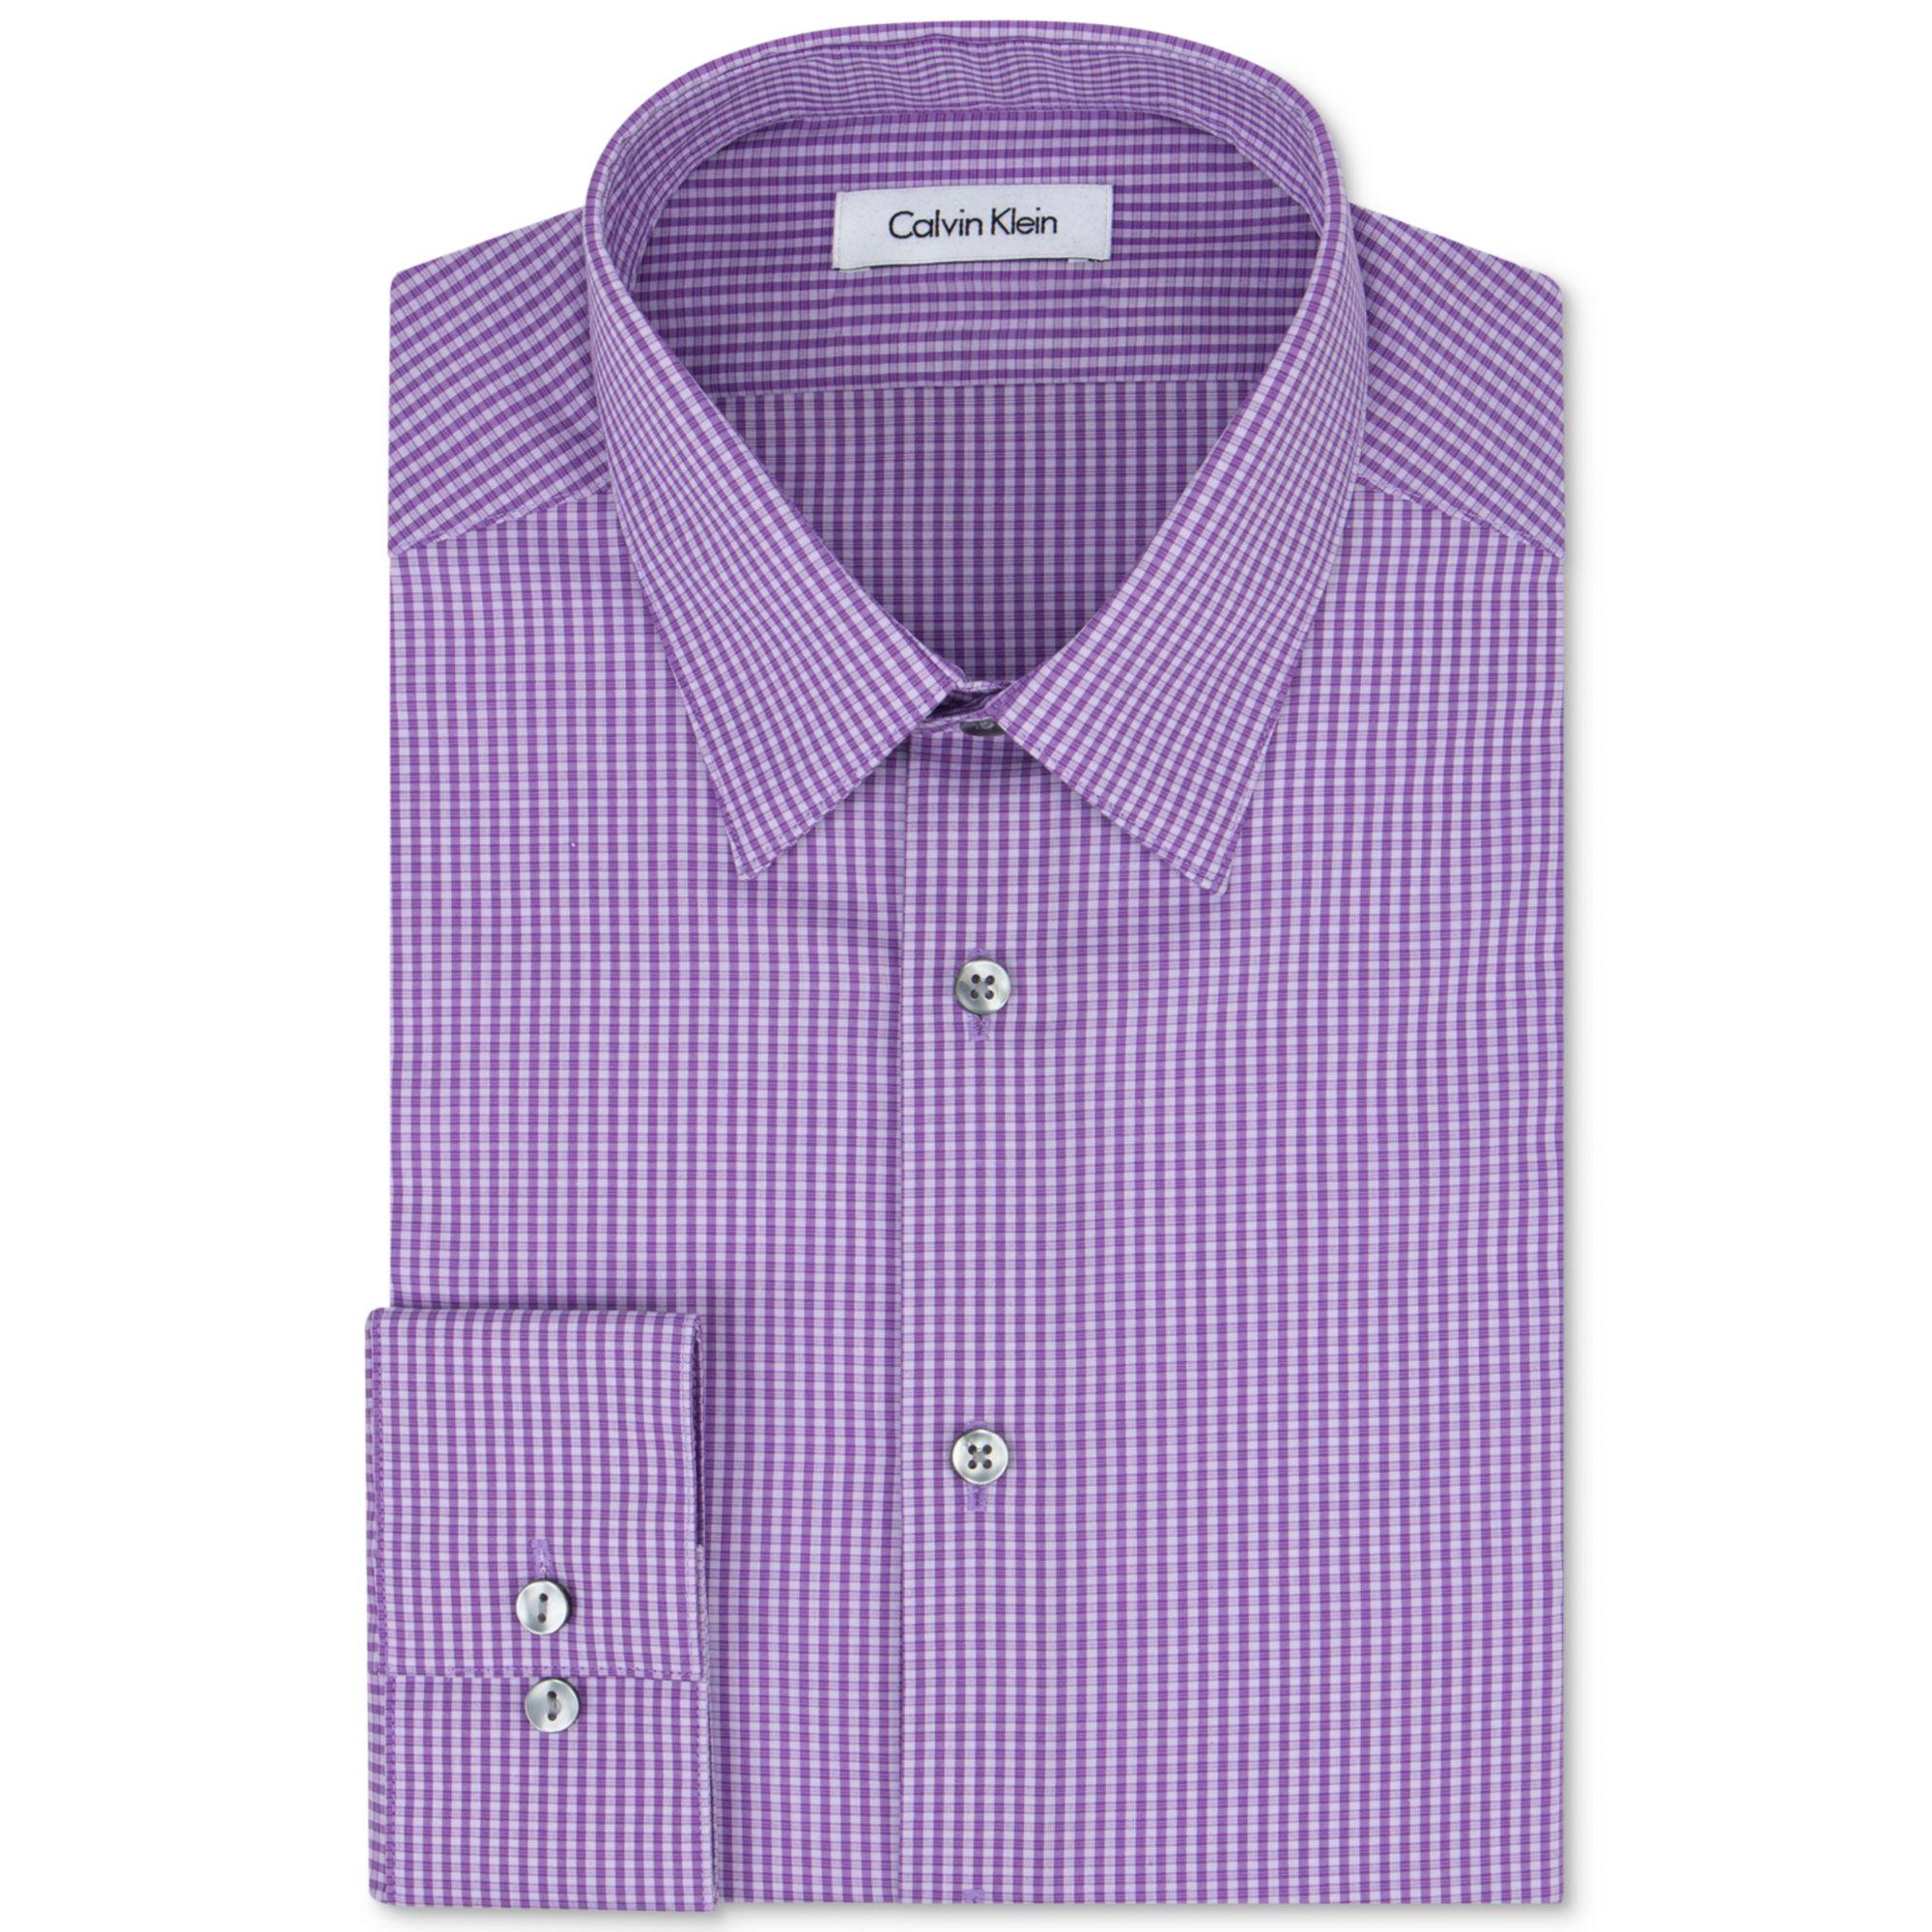 Calvin klein steel slim fit non iron purple check dress for No iron slim fit dress shirts